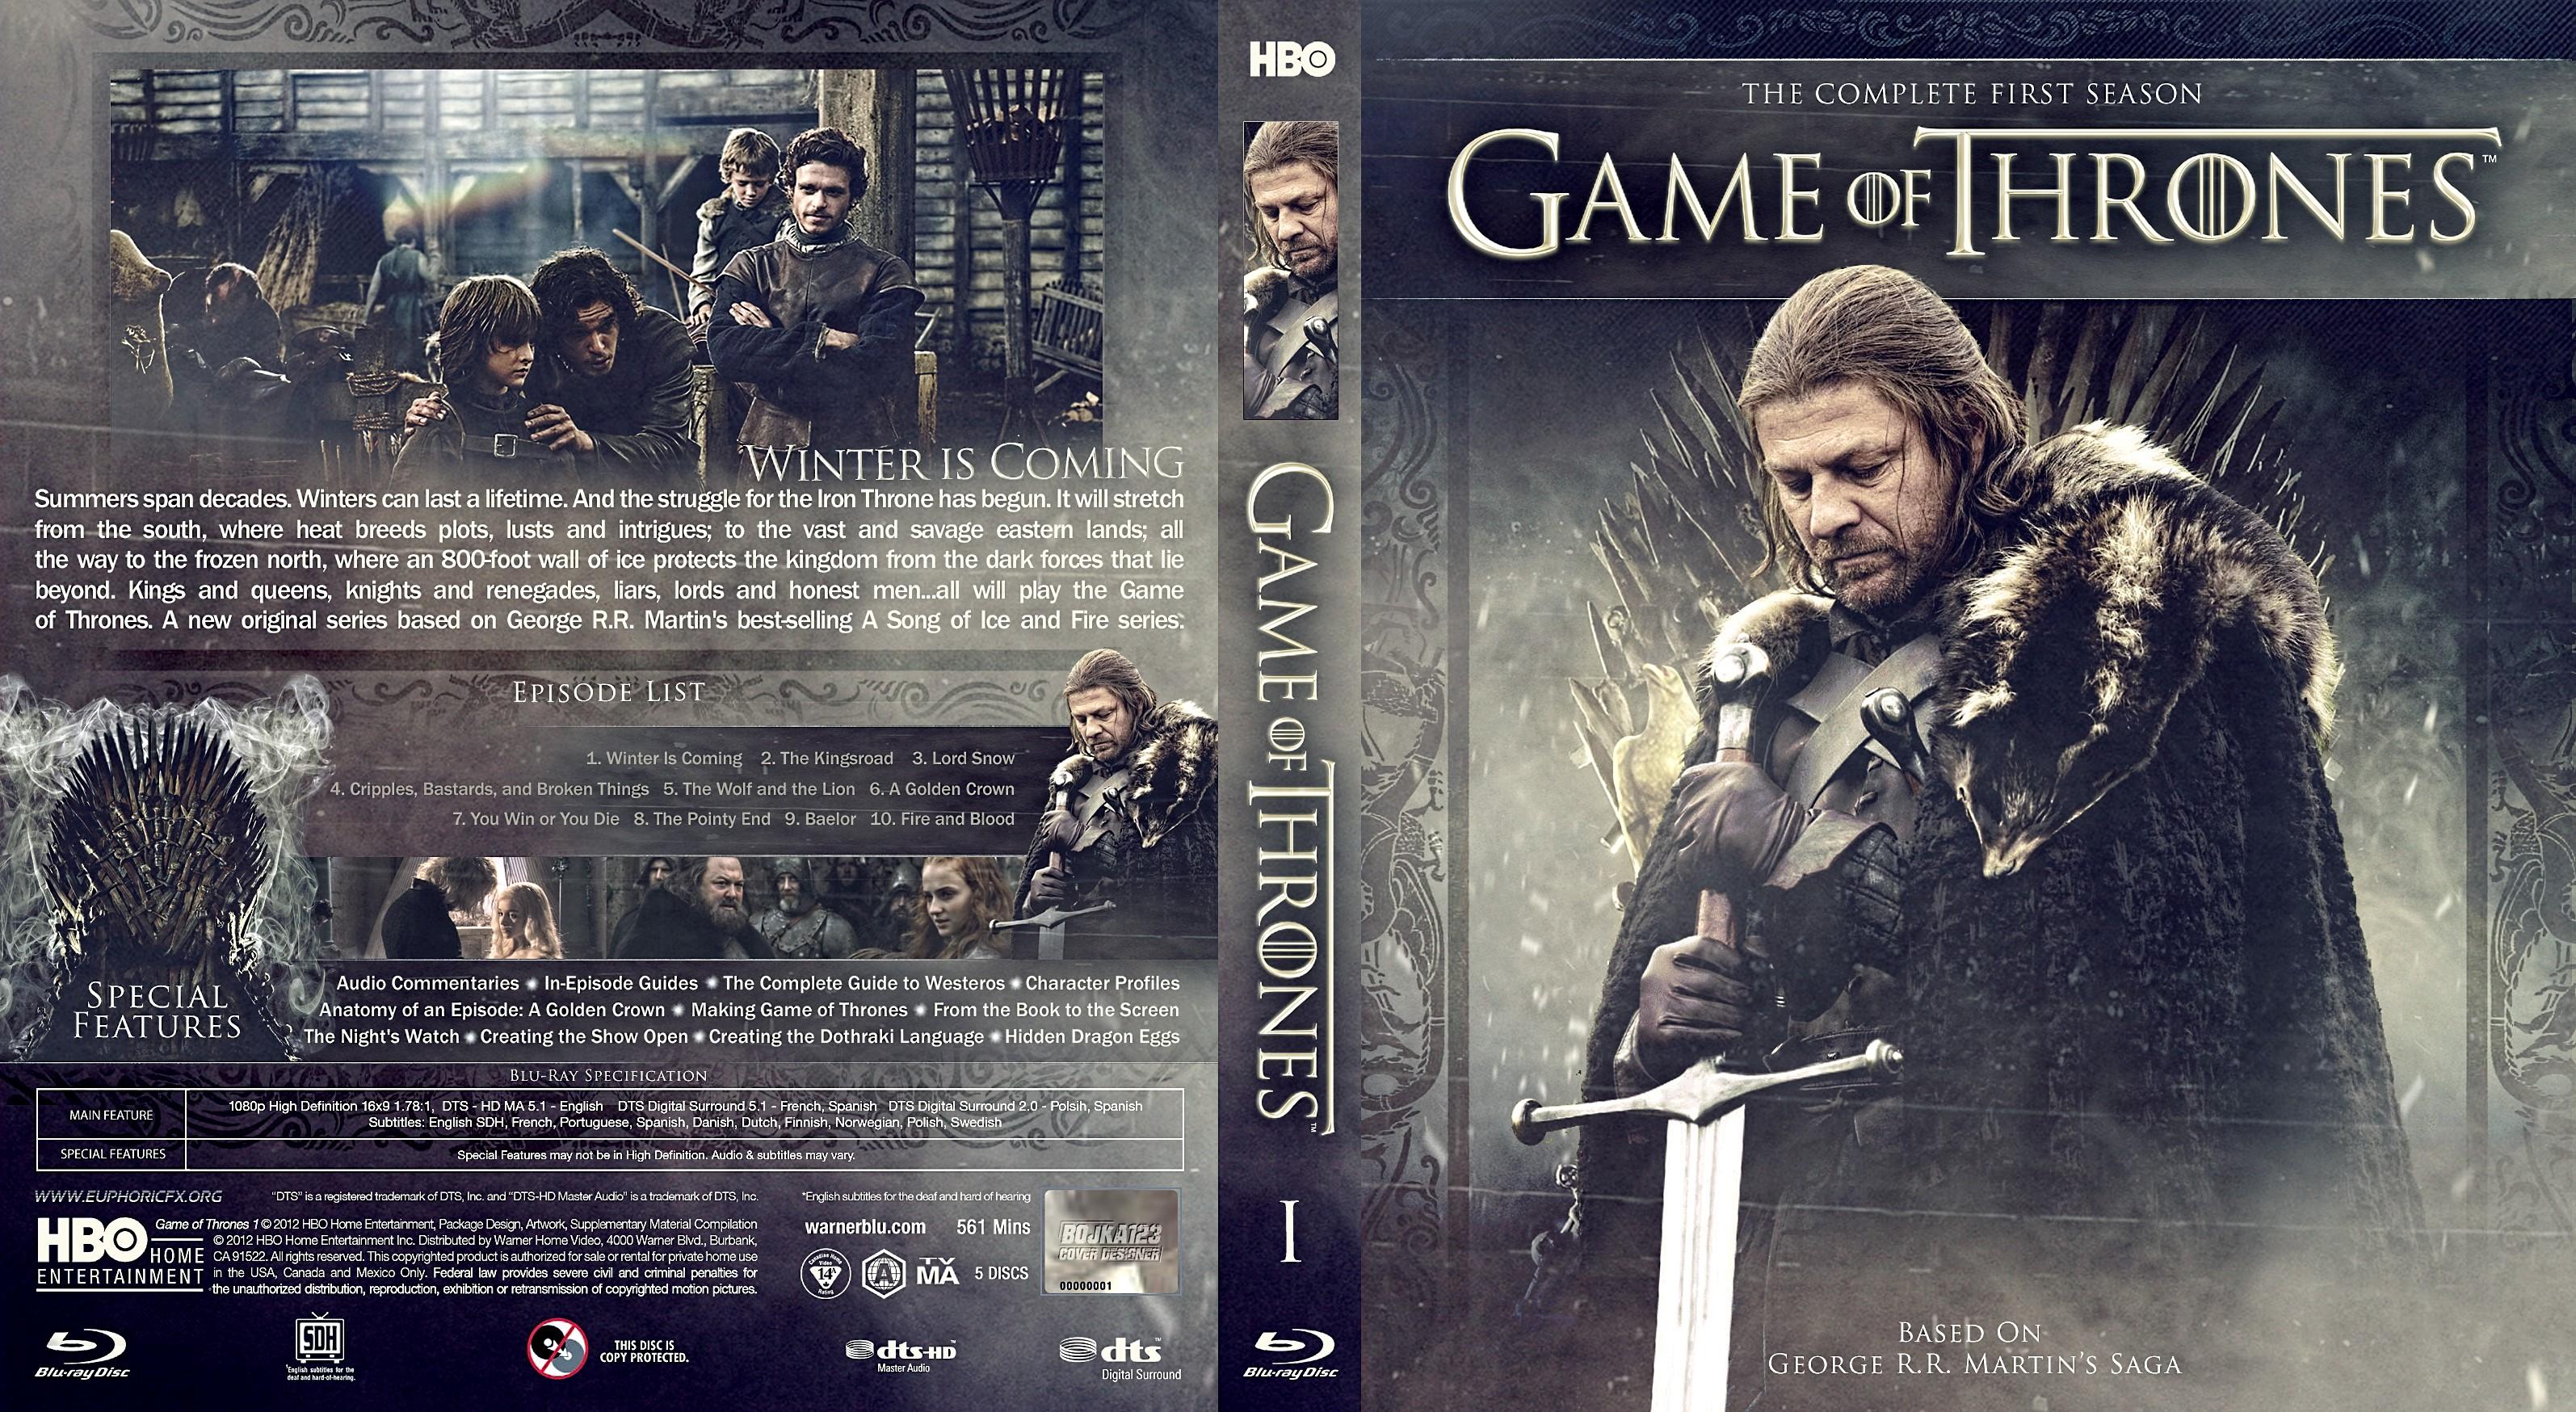 Game Of Thrones Season 5 Episode 1 Subtitles - ▷ ▷ PowerMall